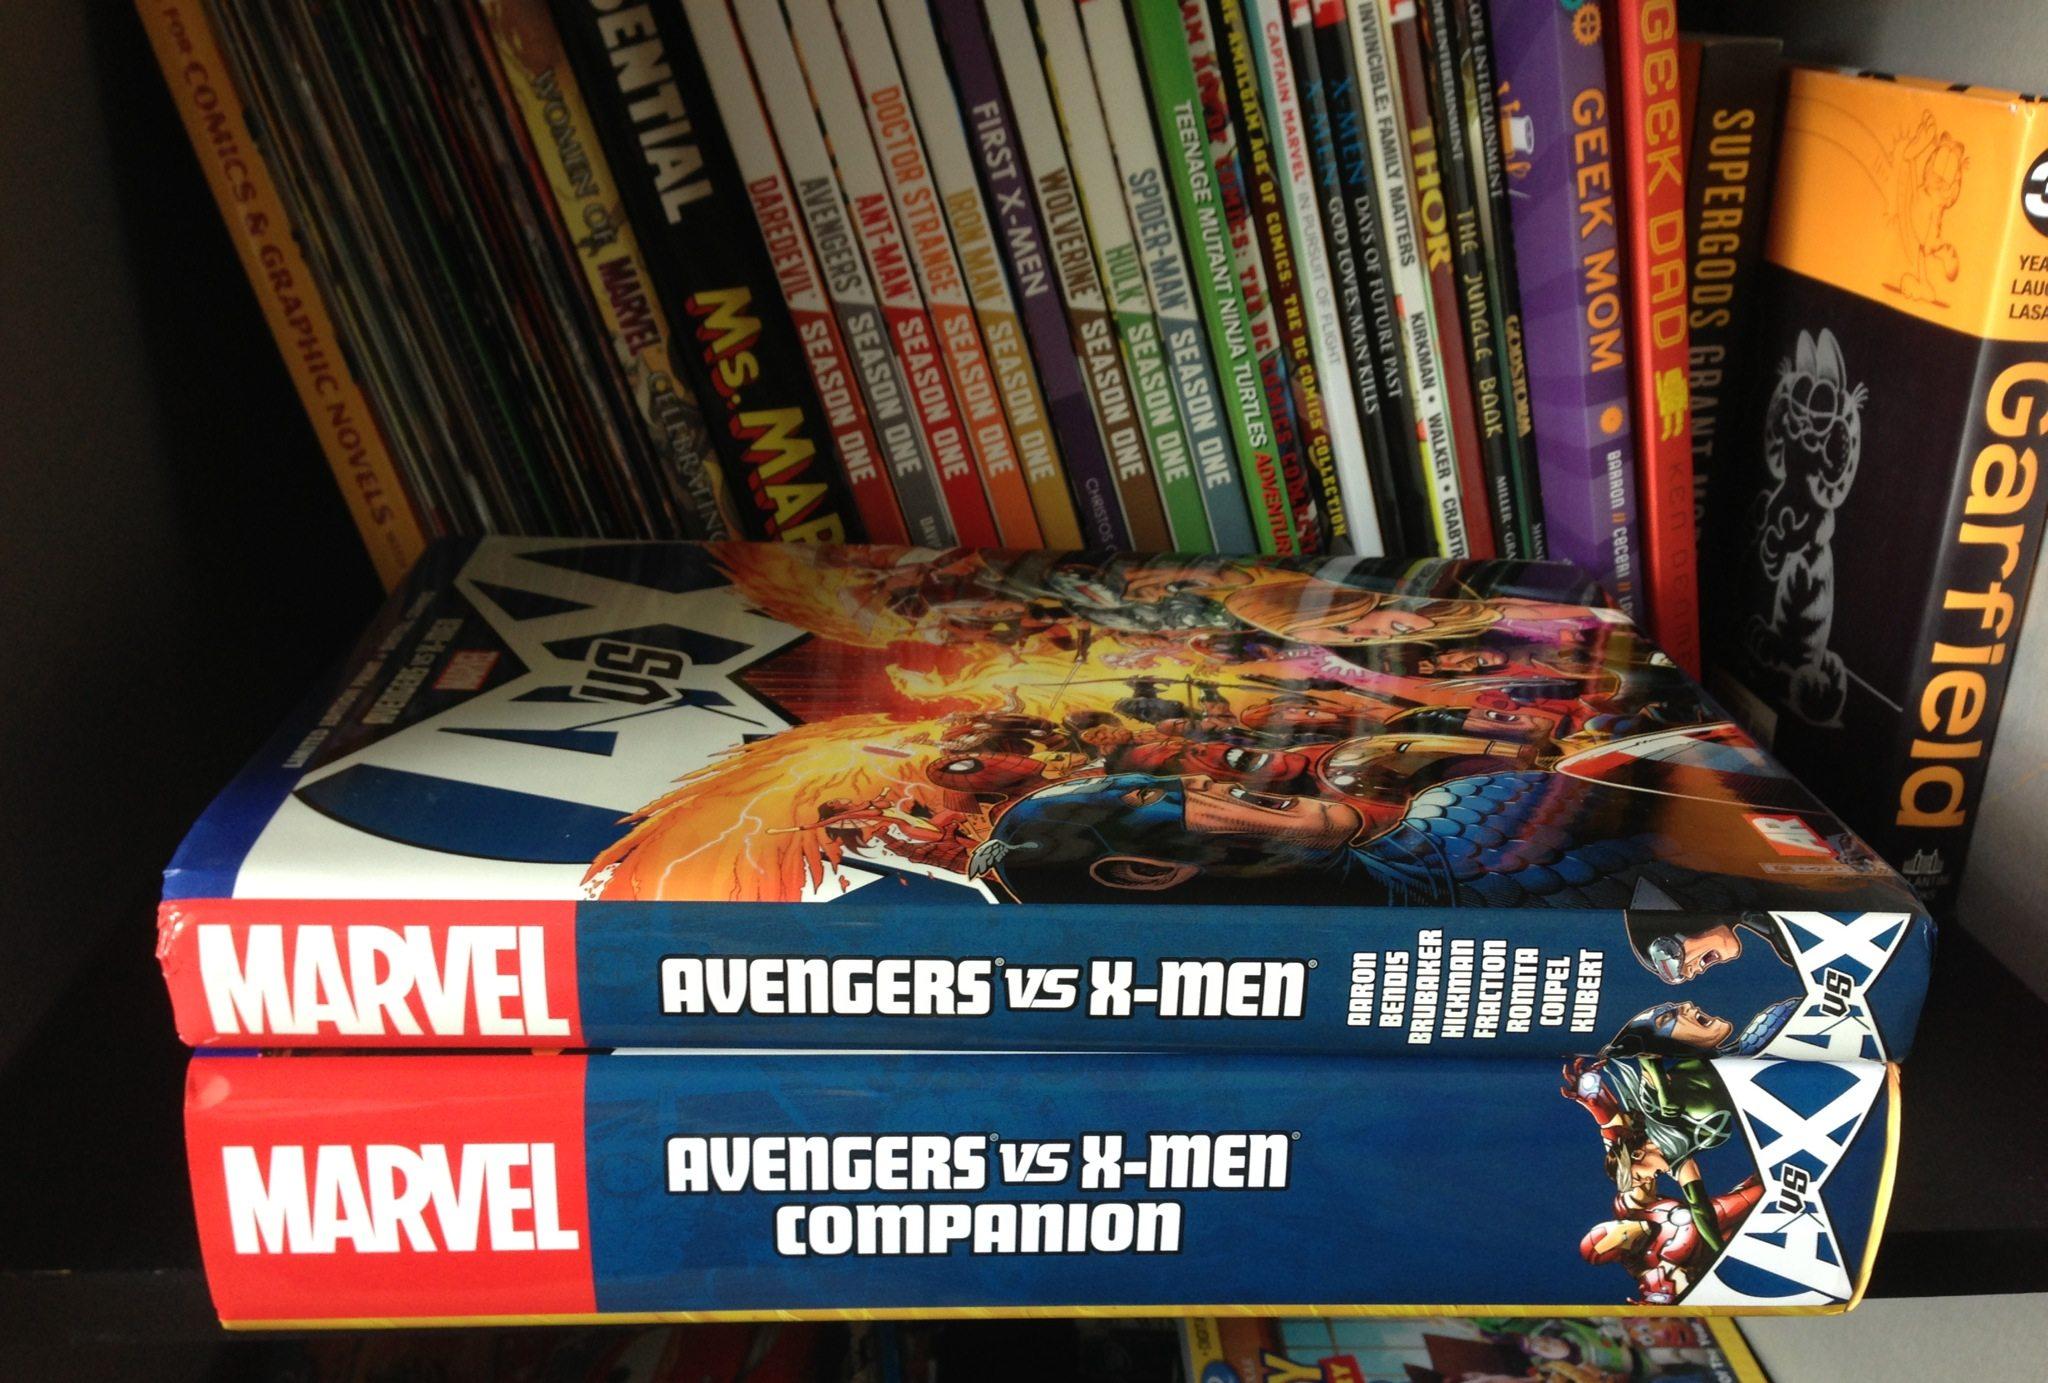 Avengers vs. X-Men Companion  Image: Dakster Sullivan